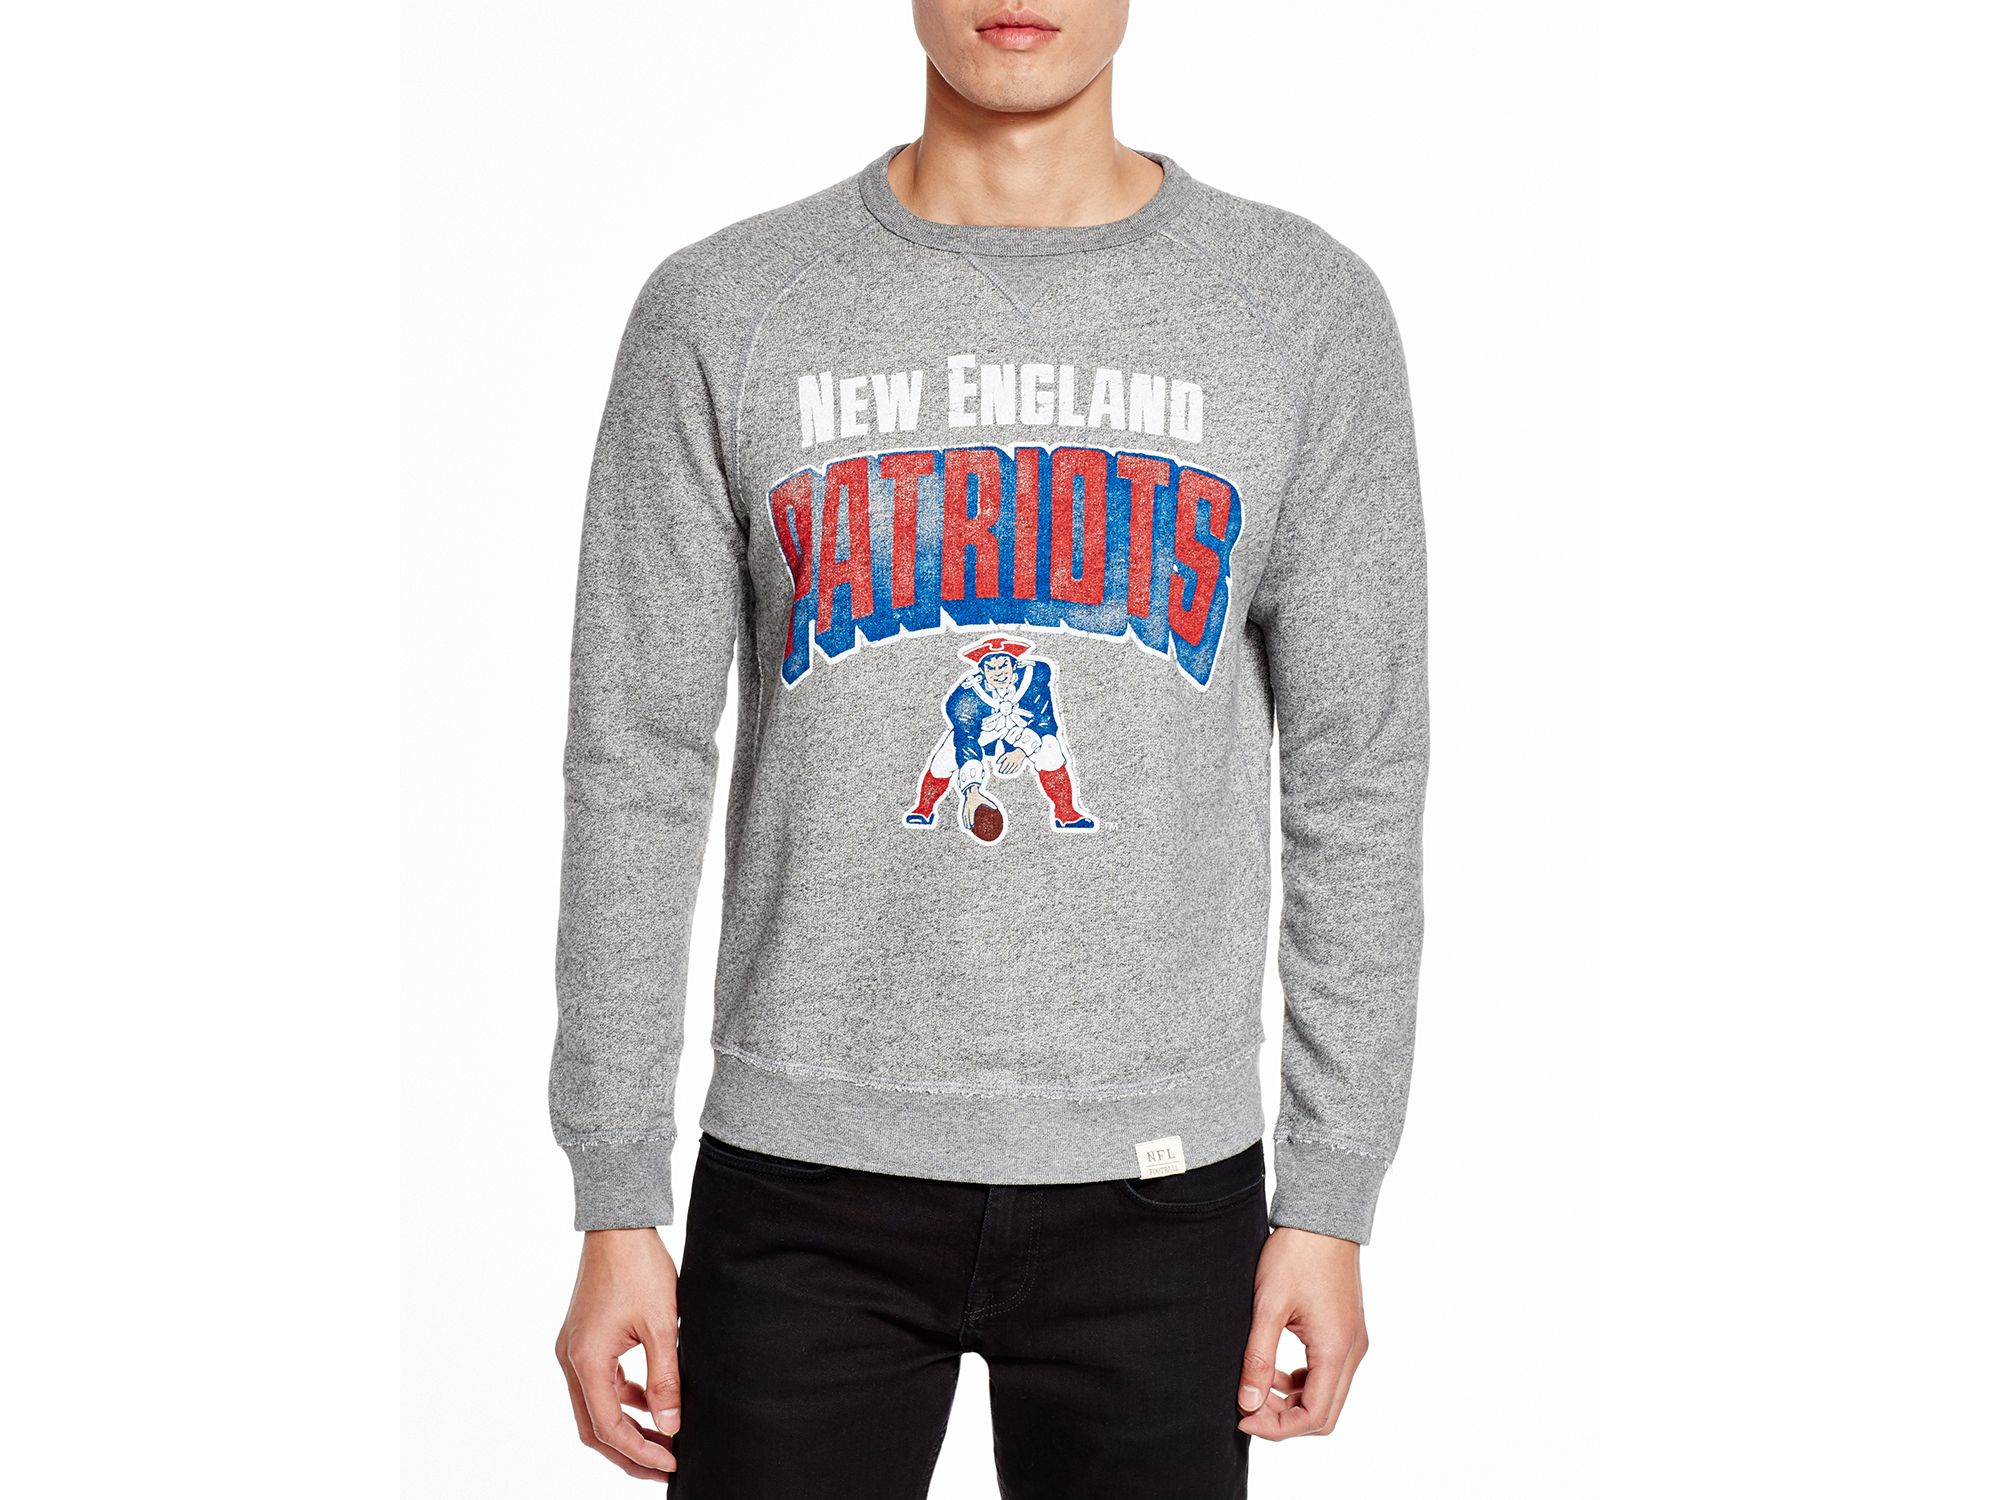 Lyst - Junk Food New England Patriots Crewneck Sweatshirt in Gray ... 380ab62df